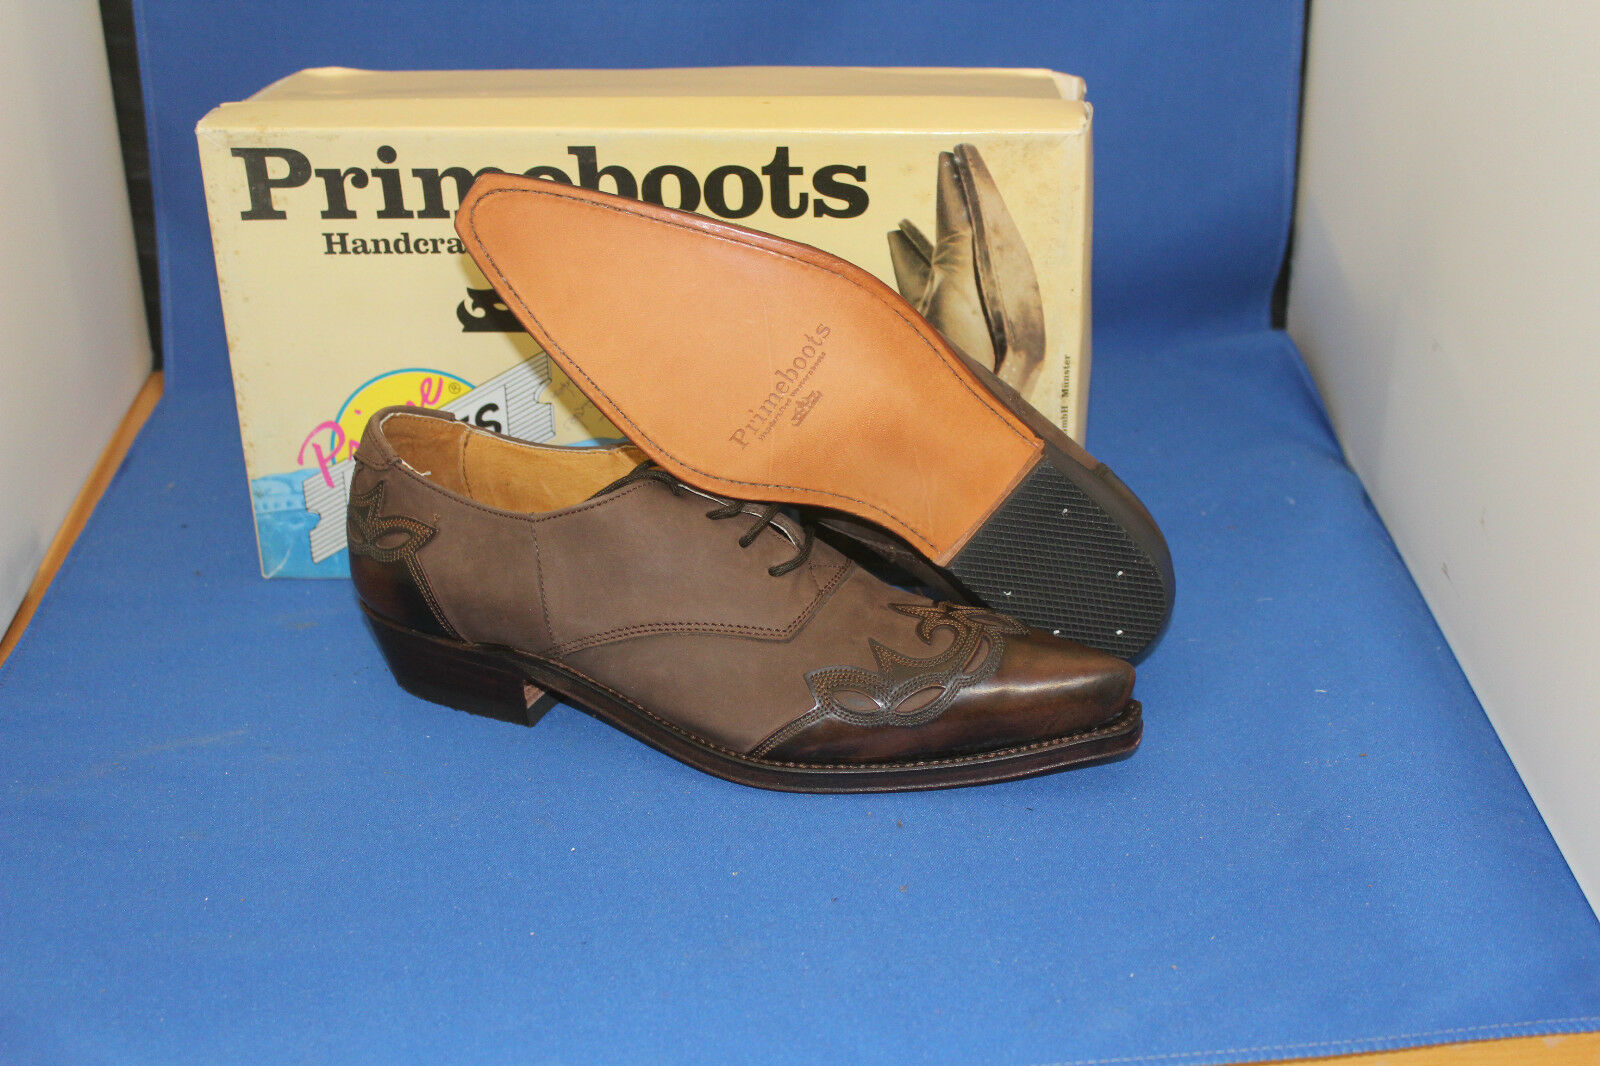 prime boots westernstiefel halbschuh cowboyboots  schnürrschuh braun  neu  cowboyboots gr. 38 b2d613